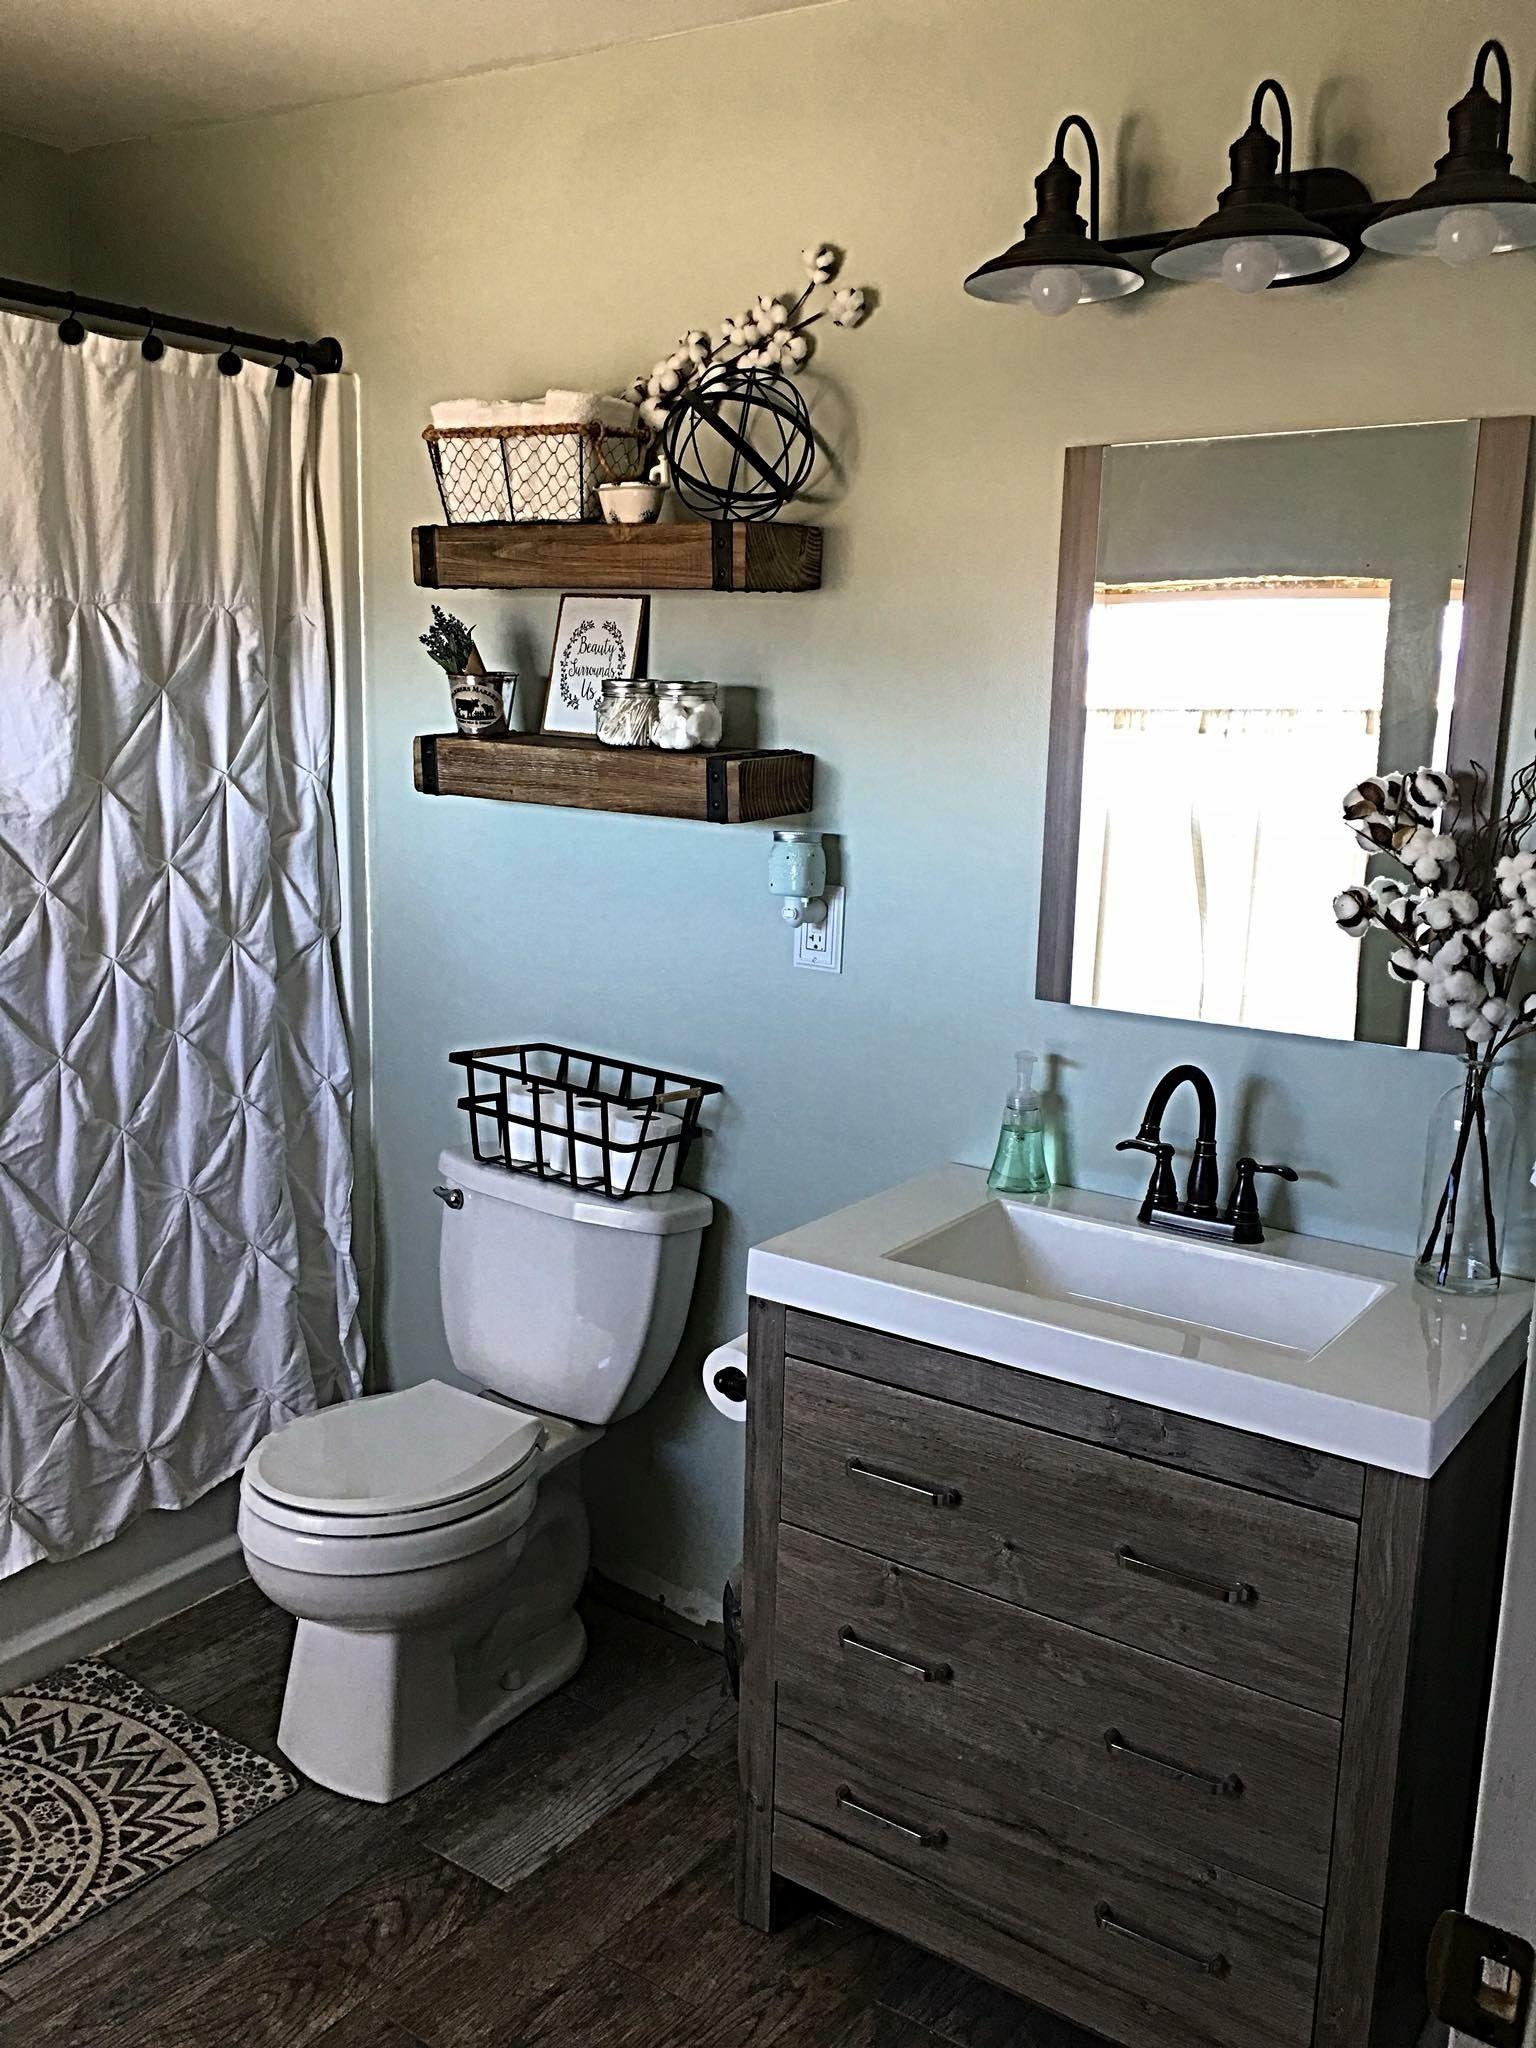 Cute Bathroom Blue Paint Cute White Shower Curtain Small Bathroom Decor Bathroom Makeovers On A Budget Small Master Bathroom